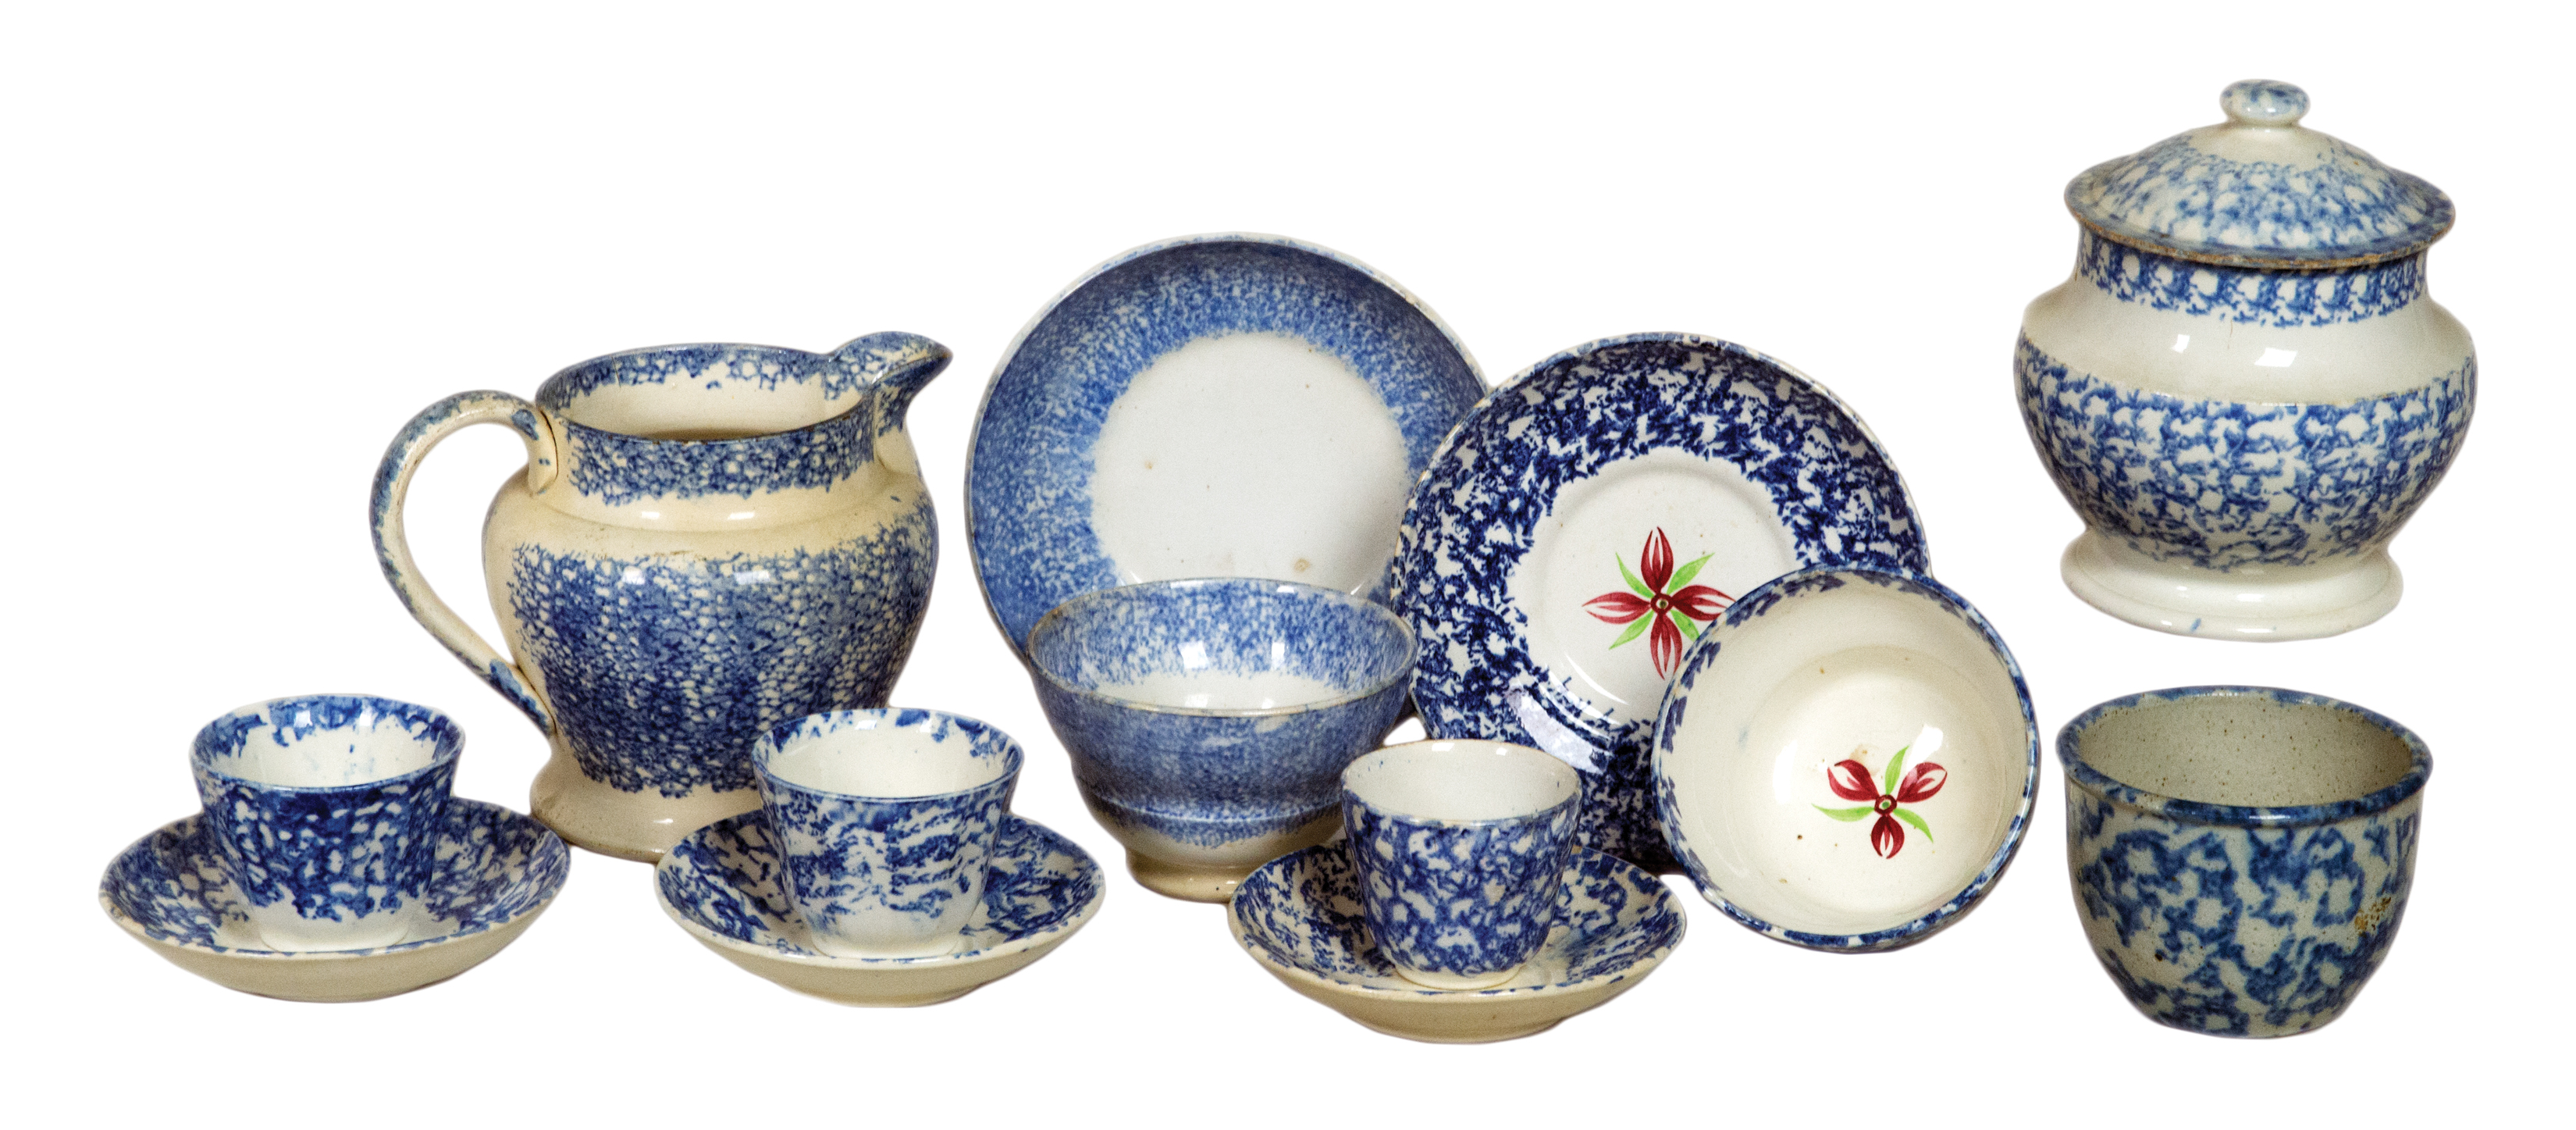 sponge, spatterware, bowls, teacups